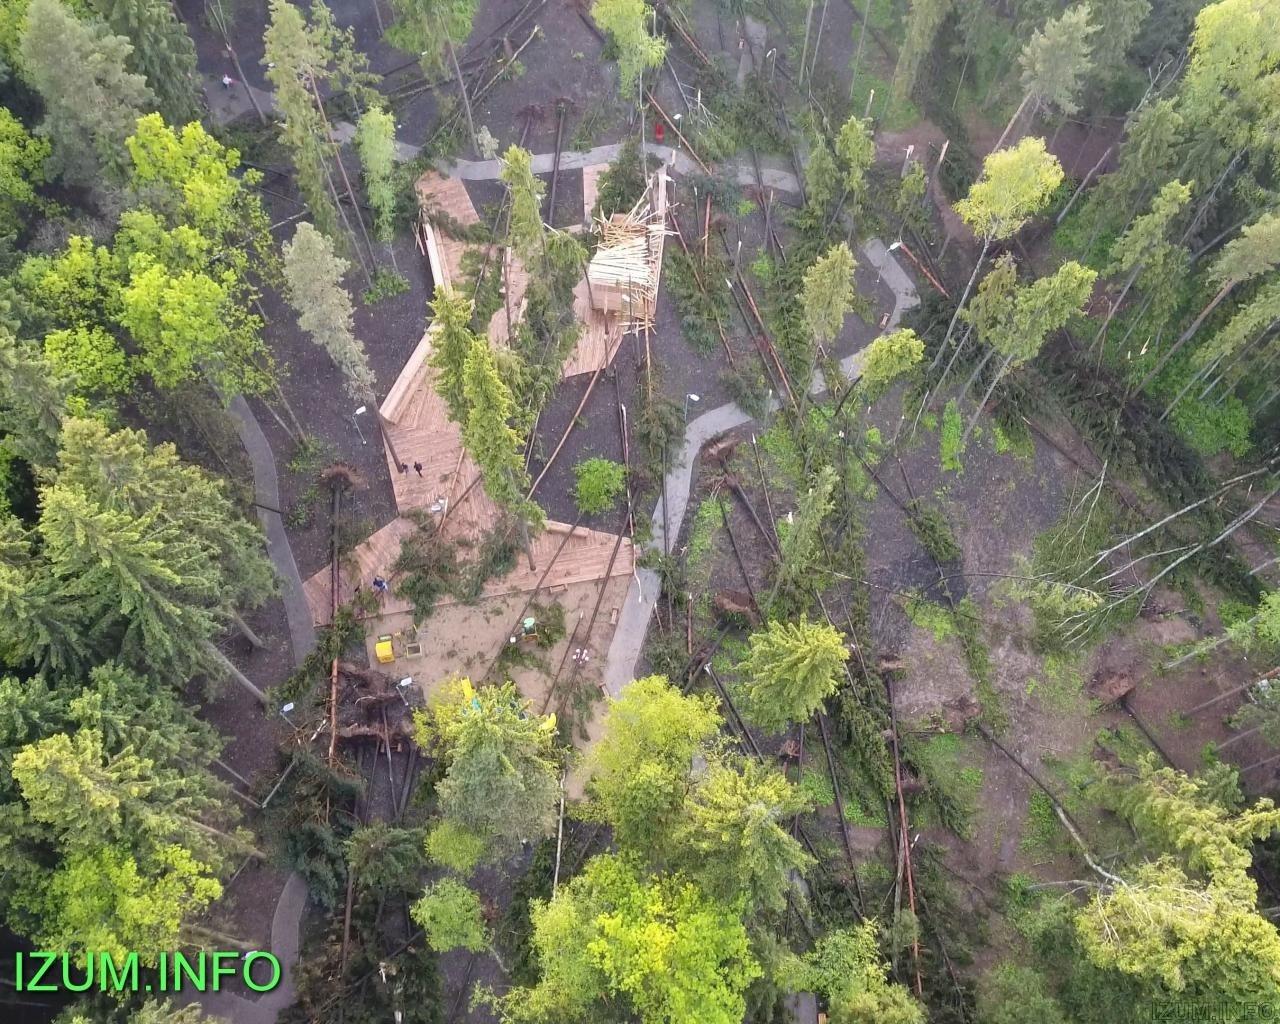 Изумрудные холмы парк после урагана (3).jpg